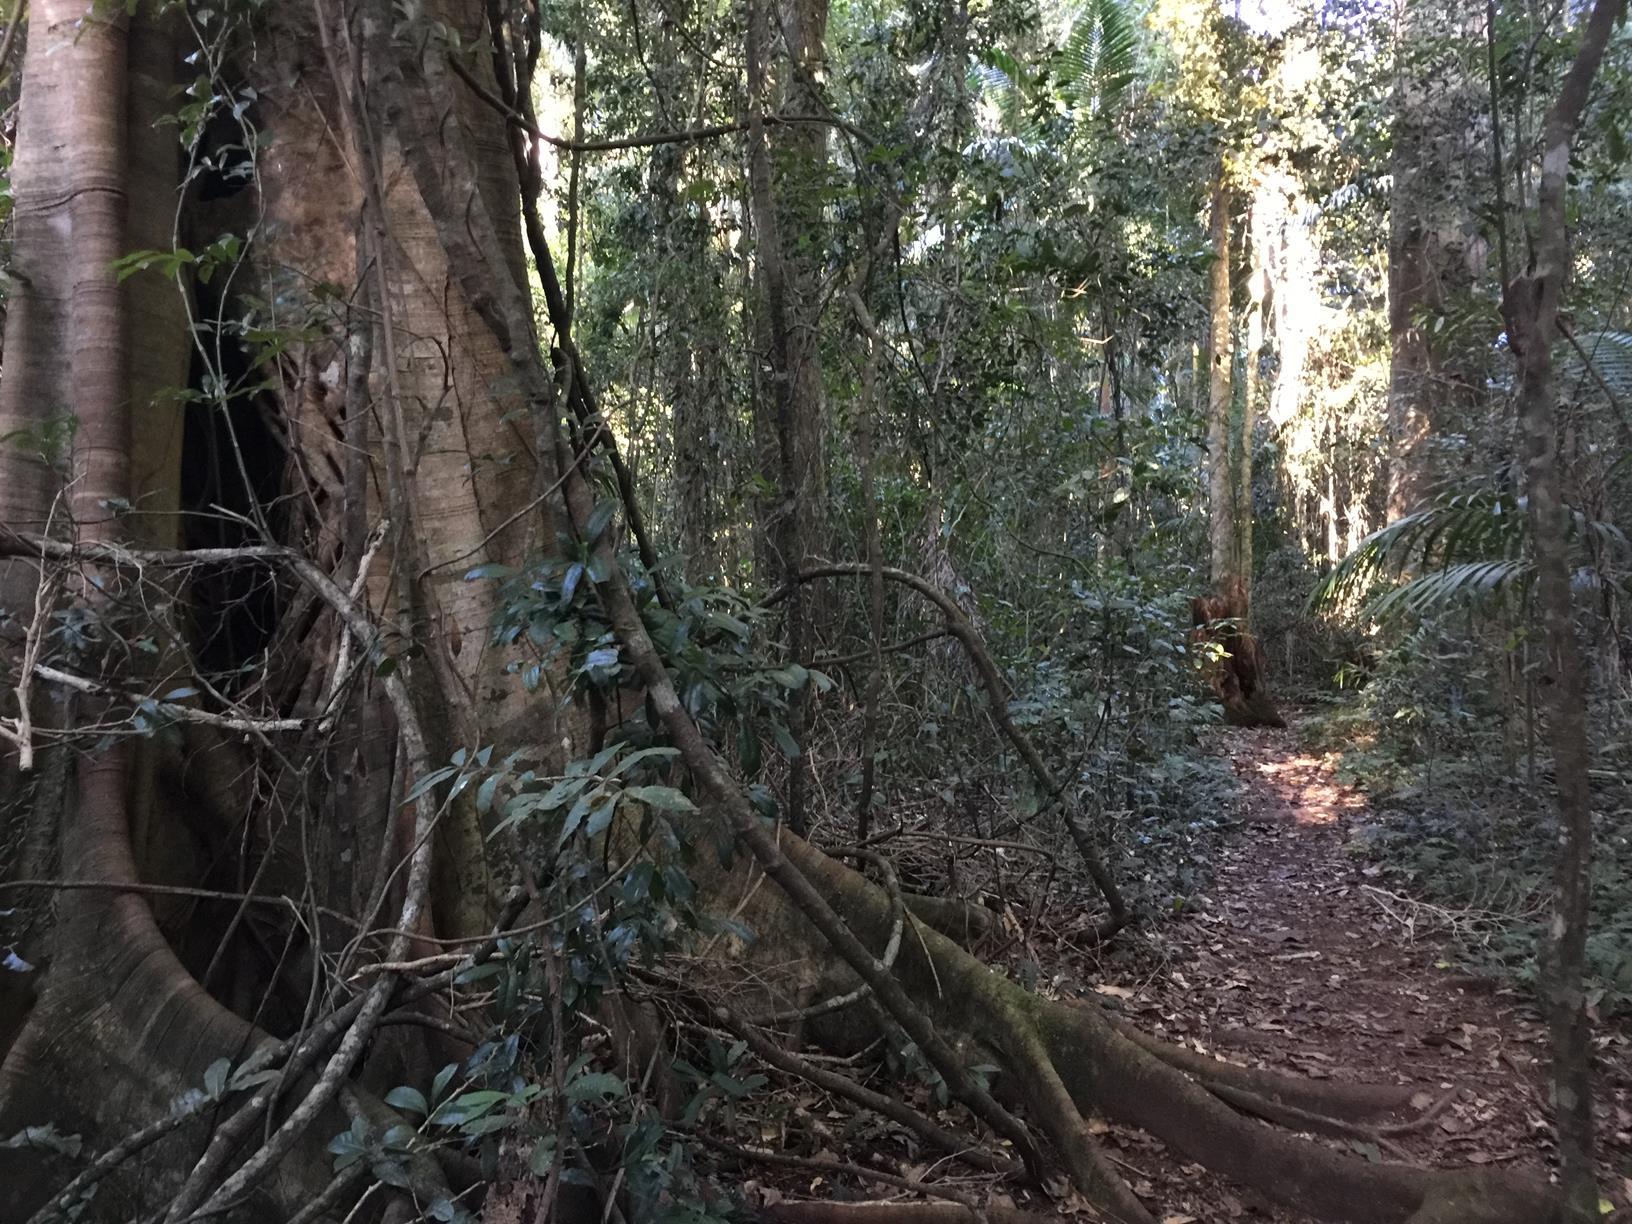 Trail Image for Conondale National Park: Booloumba Gold Mine Walk